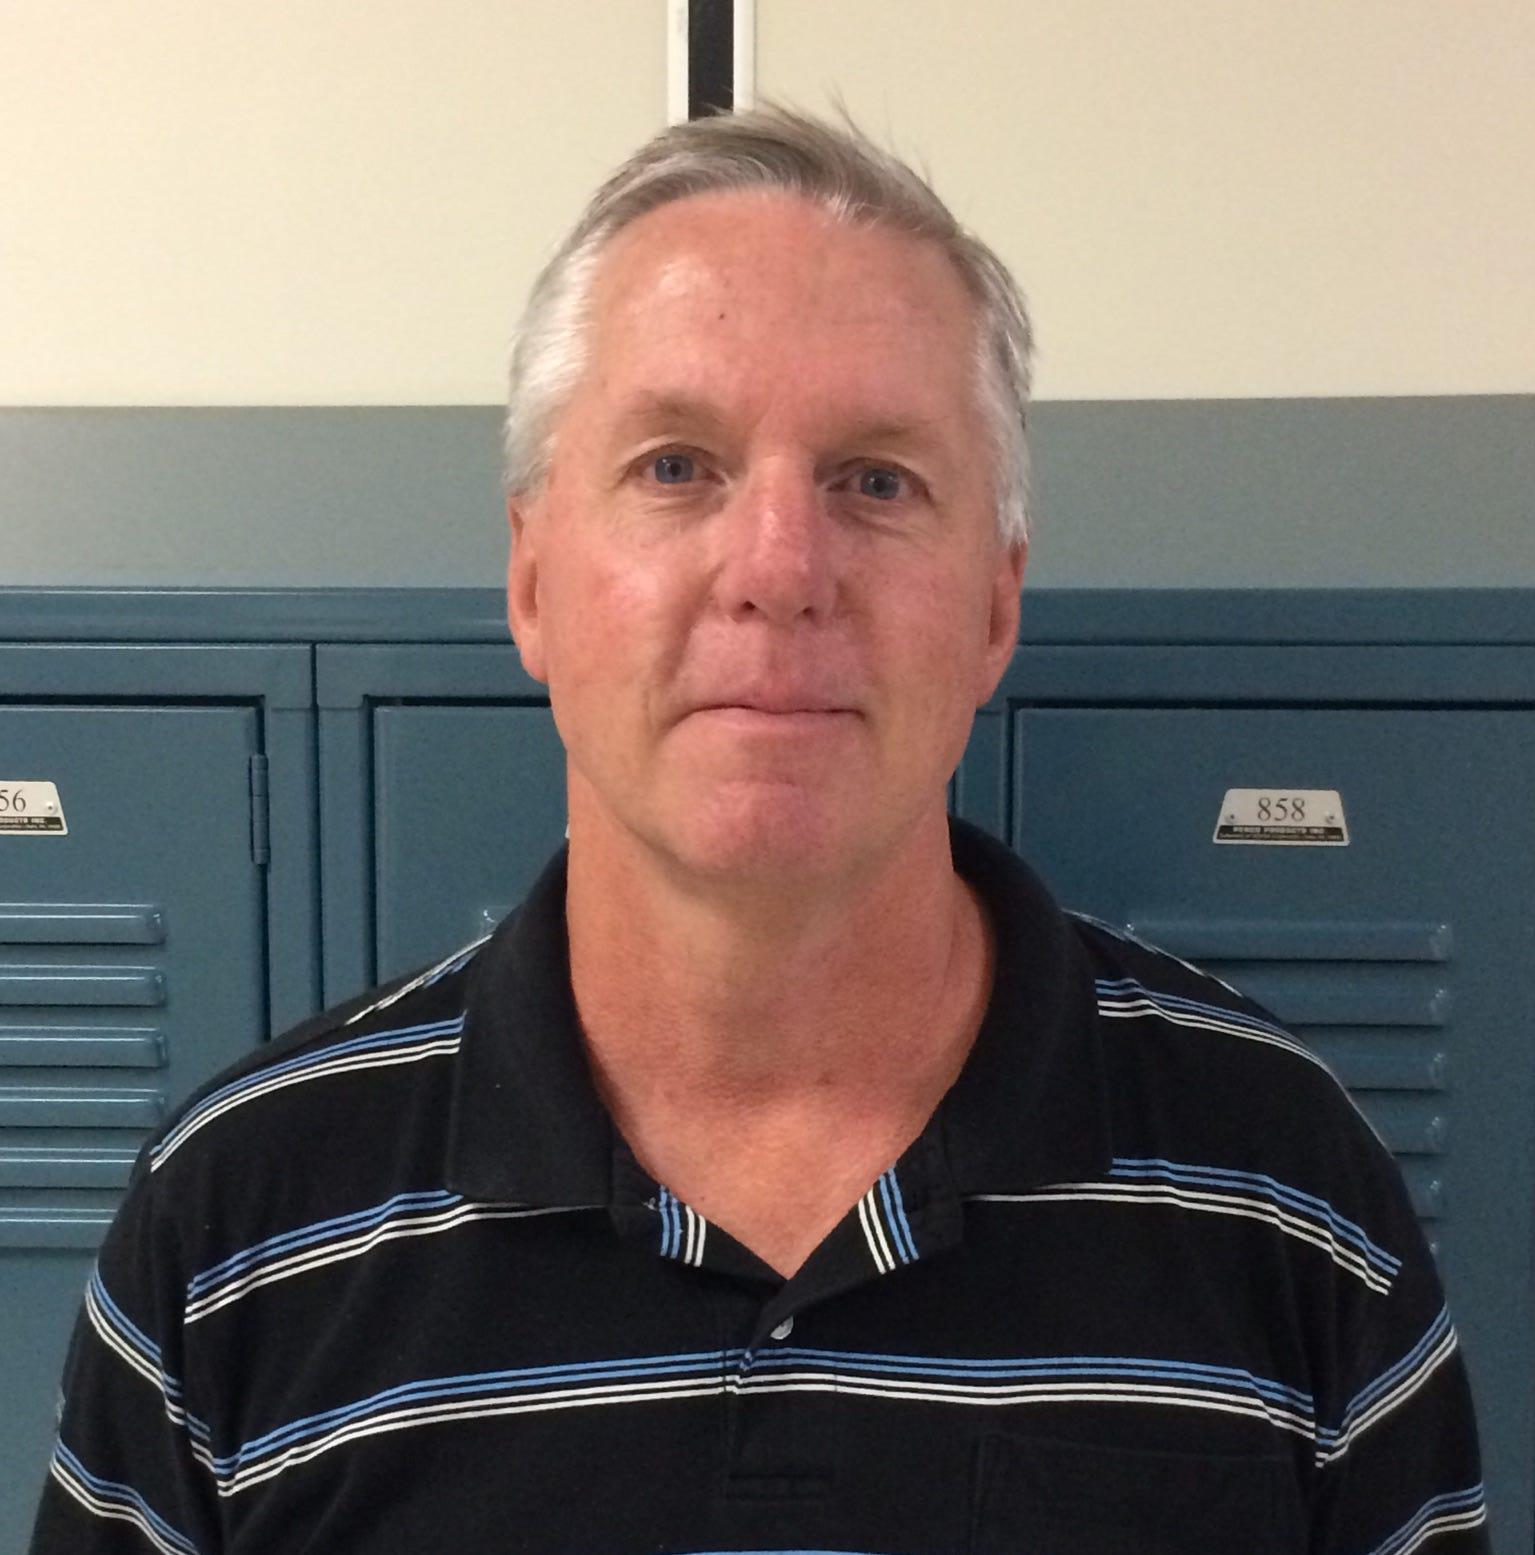 Varvel: How Greensburg High School spiced up the Pledge of Allegiance